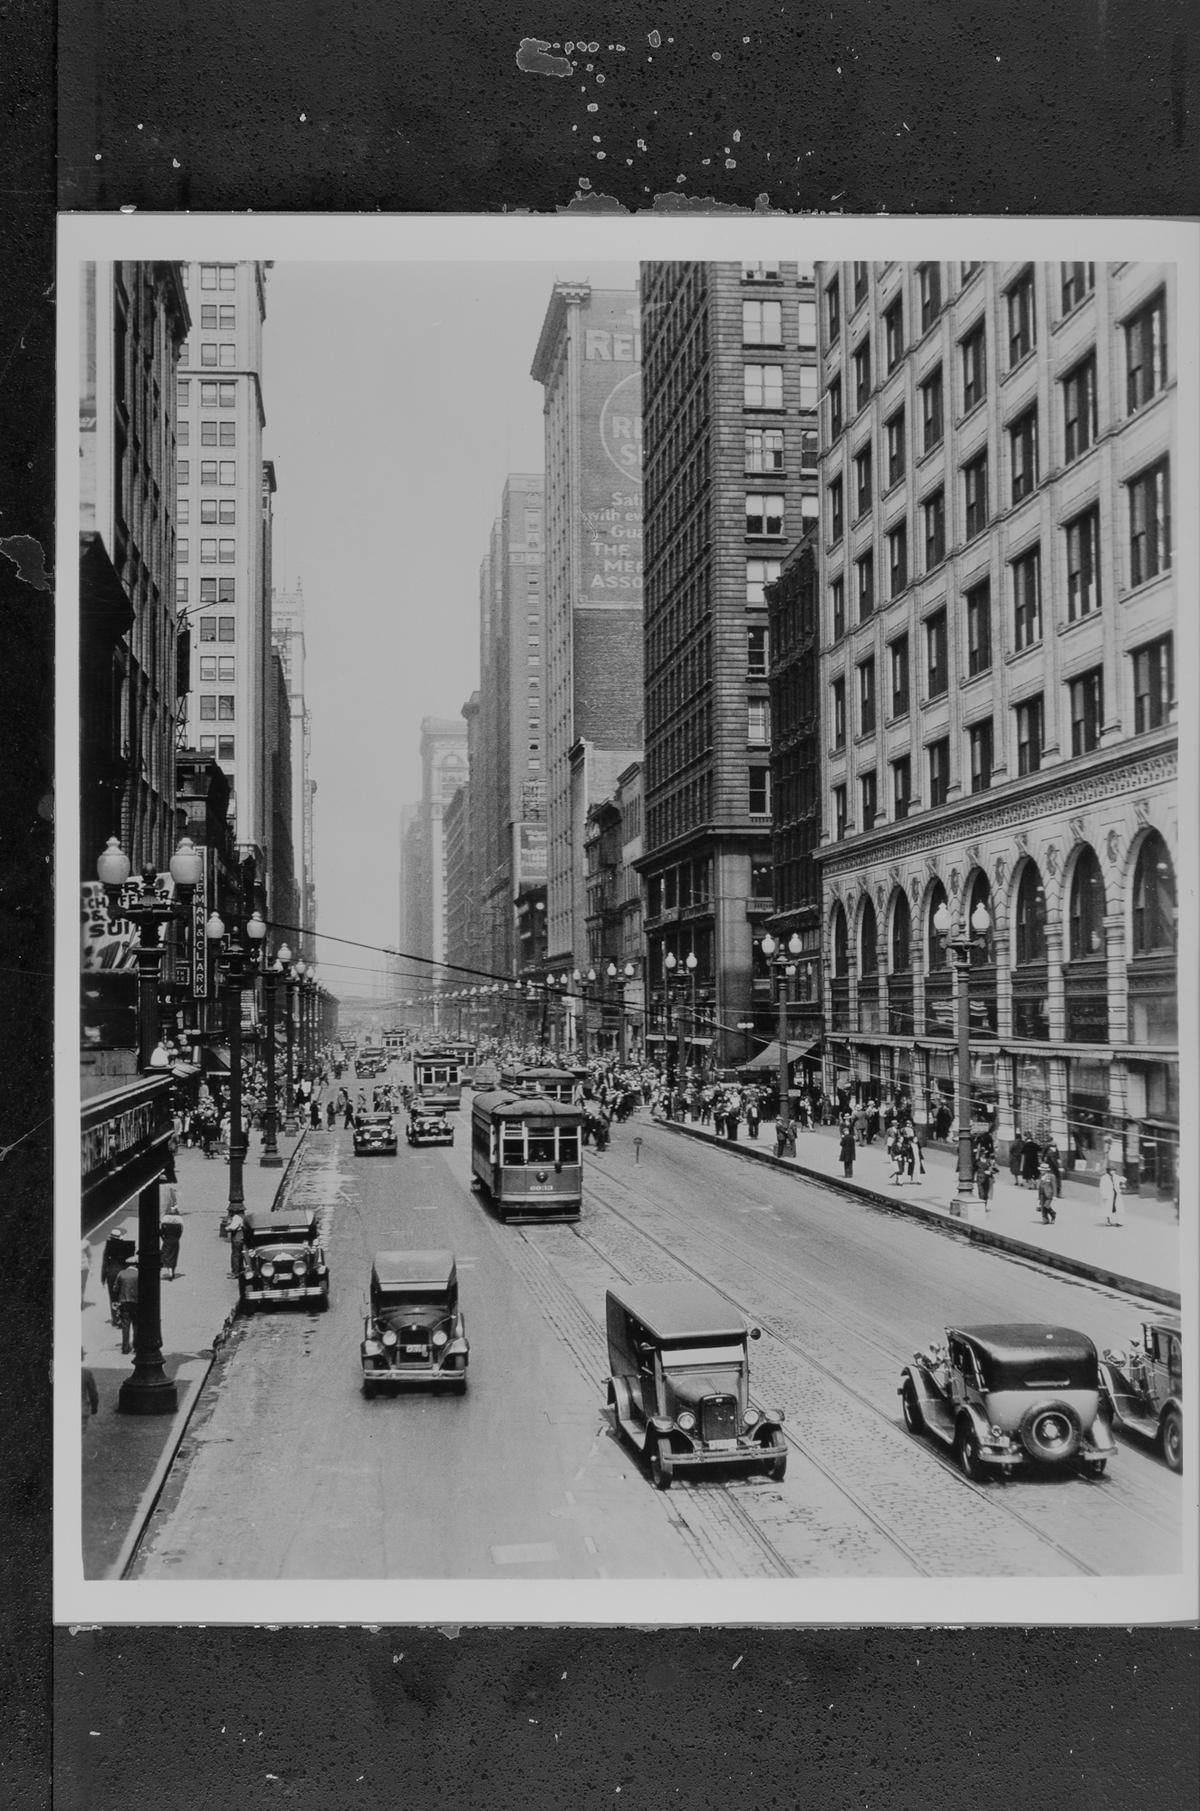 400 S. State Street; Goldblatt's store at right